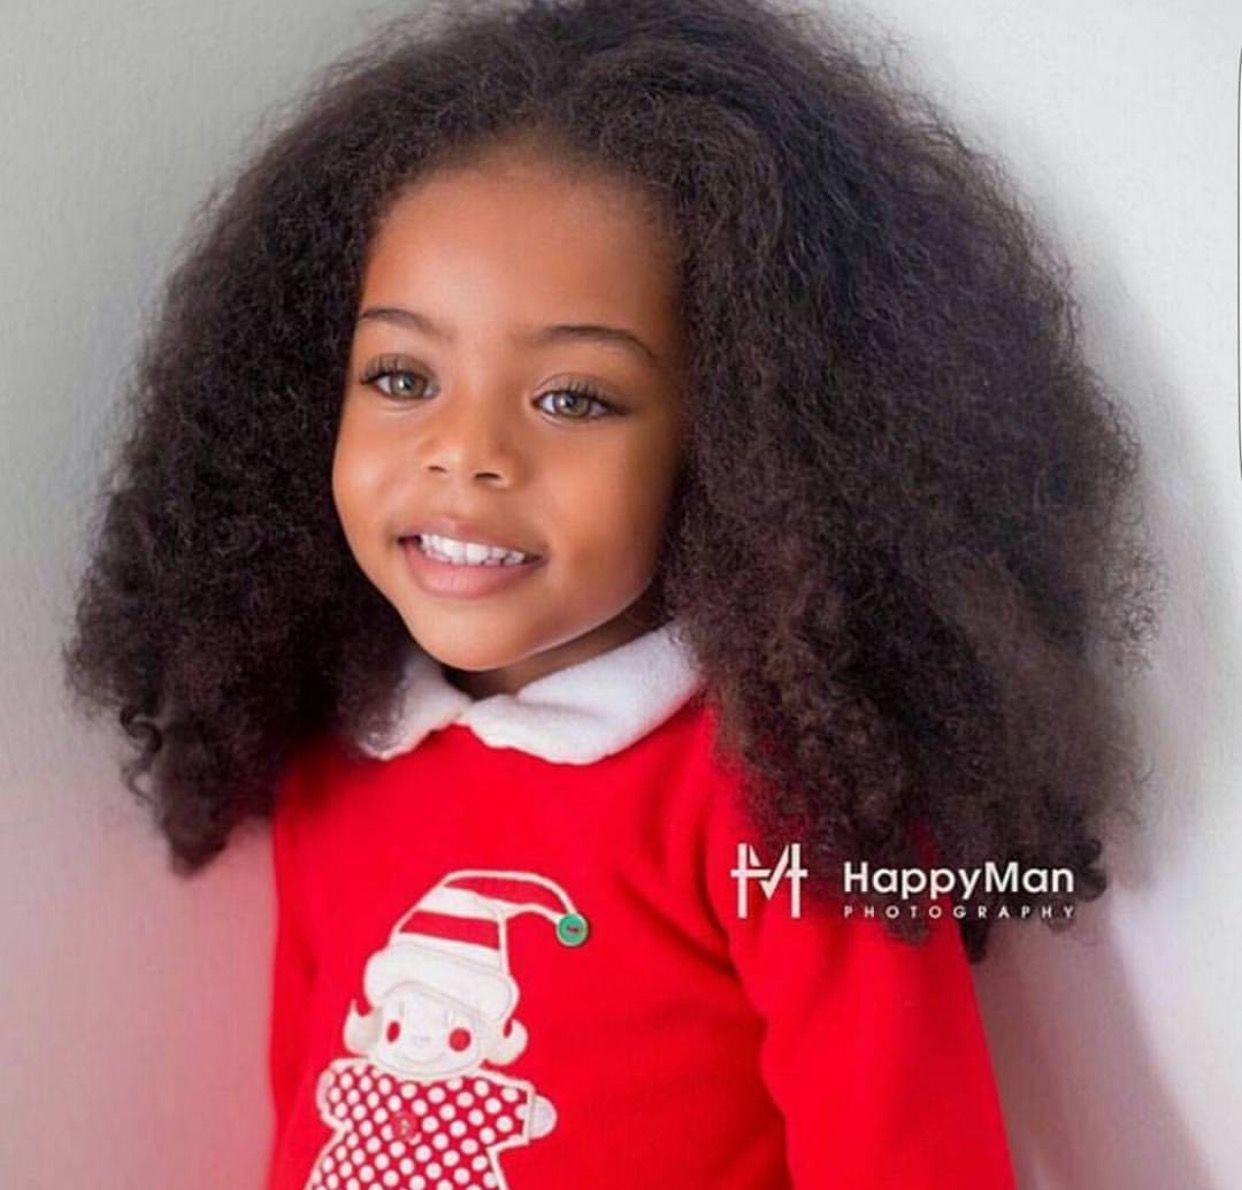 Cute Toddler Girl With Green Or Hazel Eyes Mixed Kids Hairstyles Kids Hairstyles Beautiful Black Babies